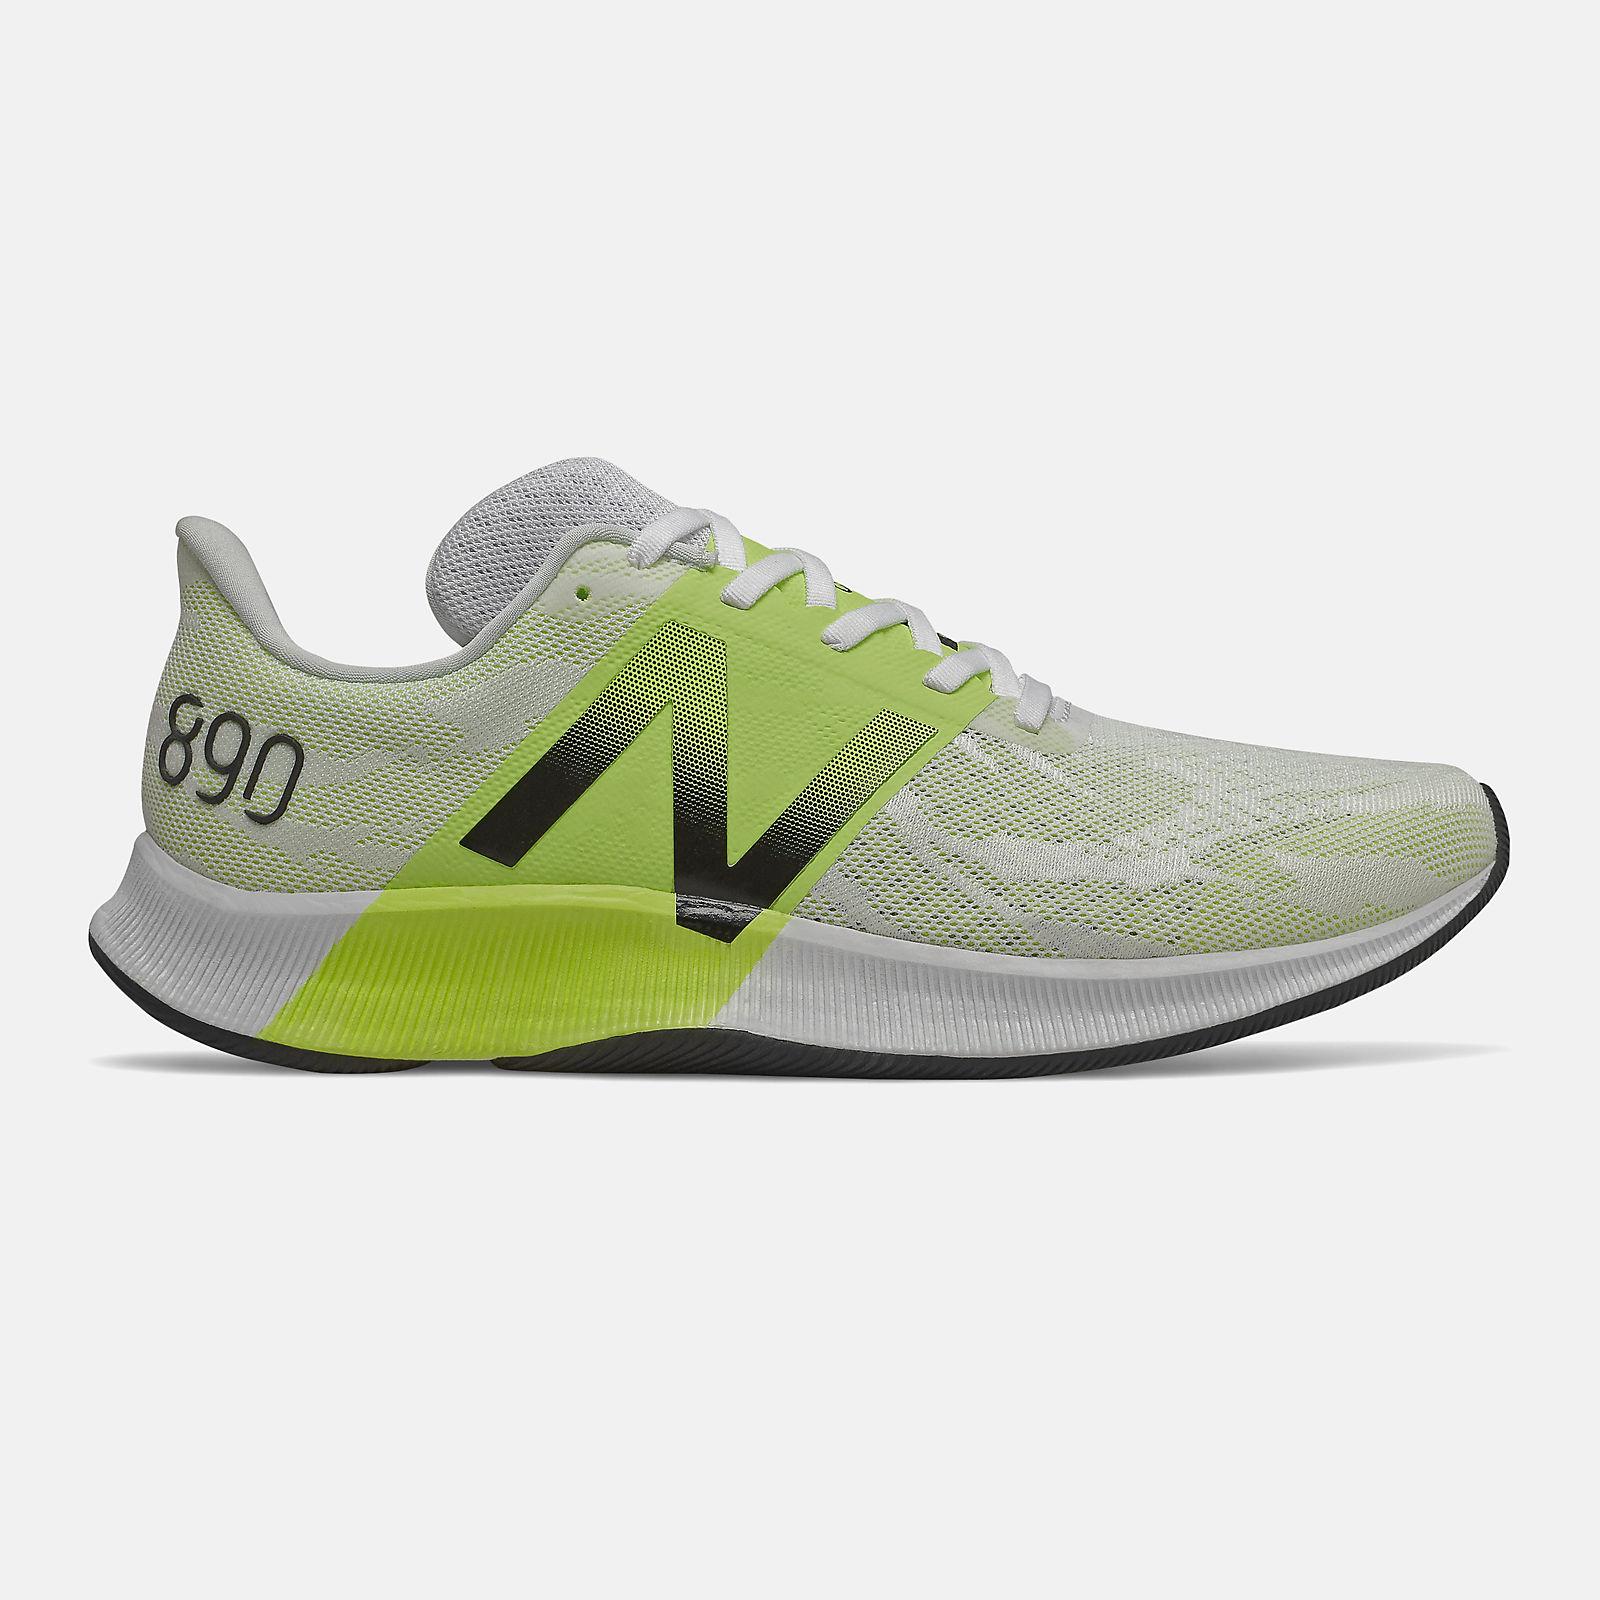 new balance 890 uomo